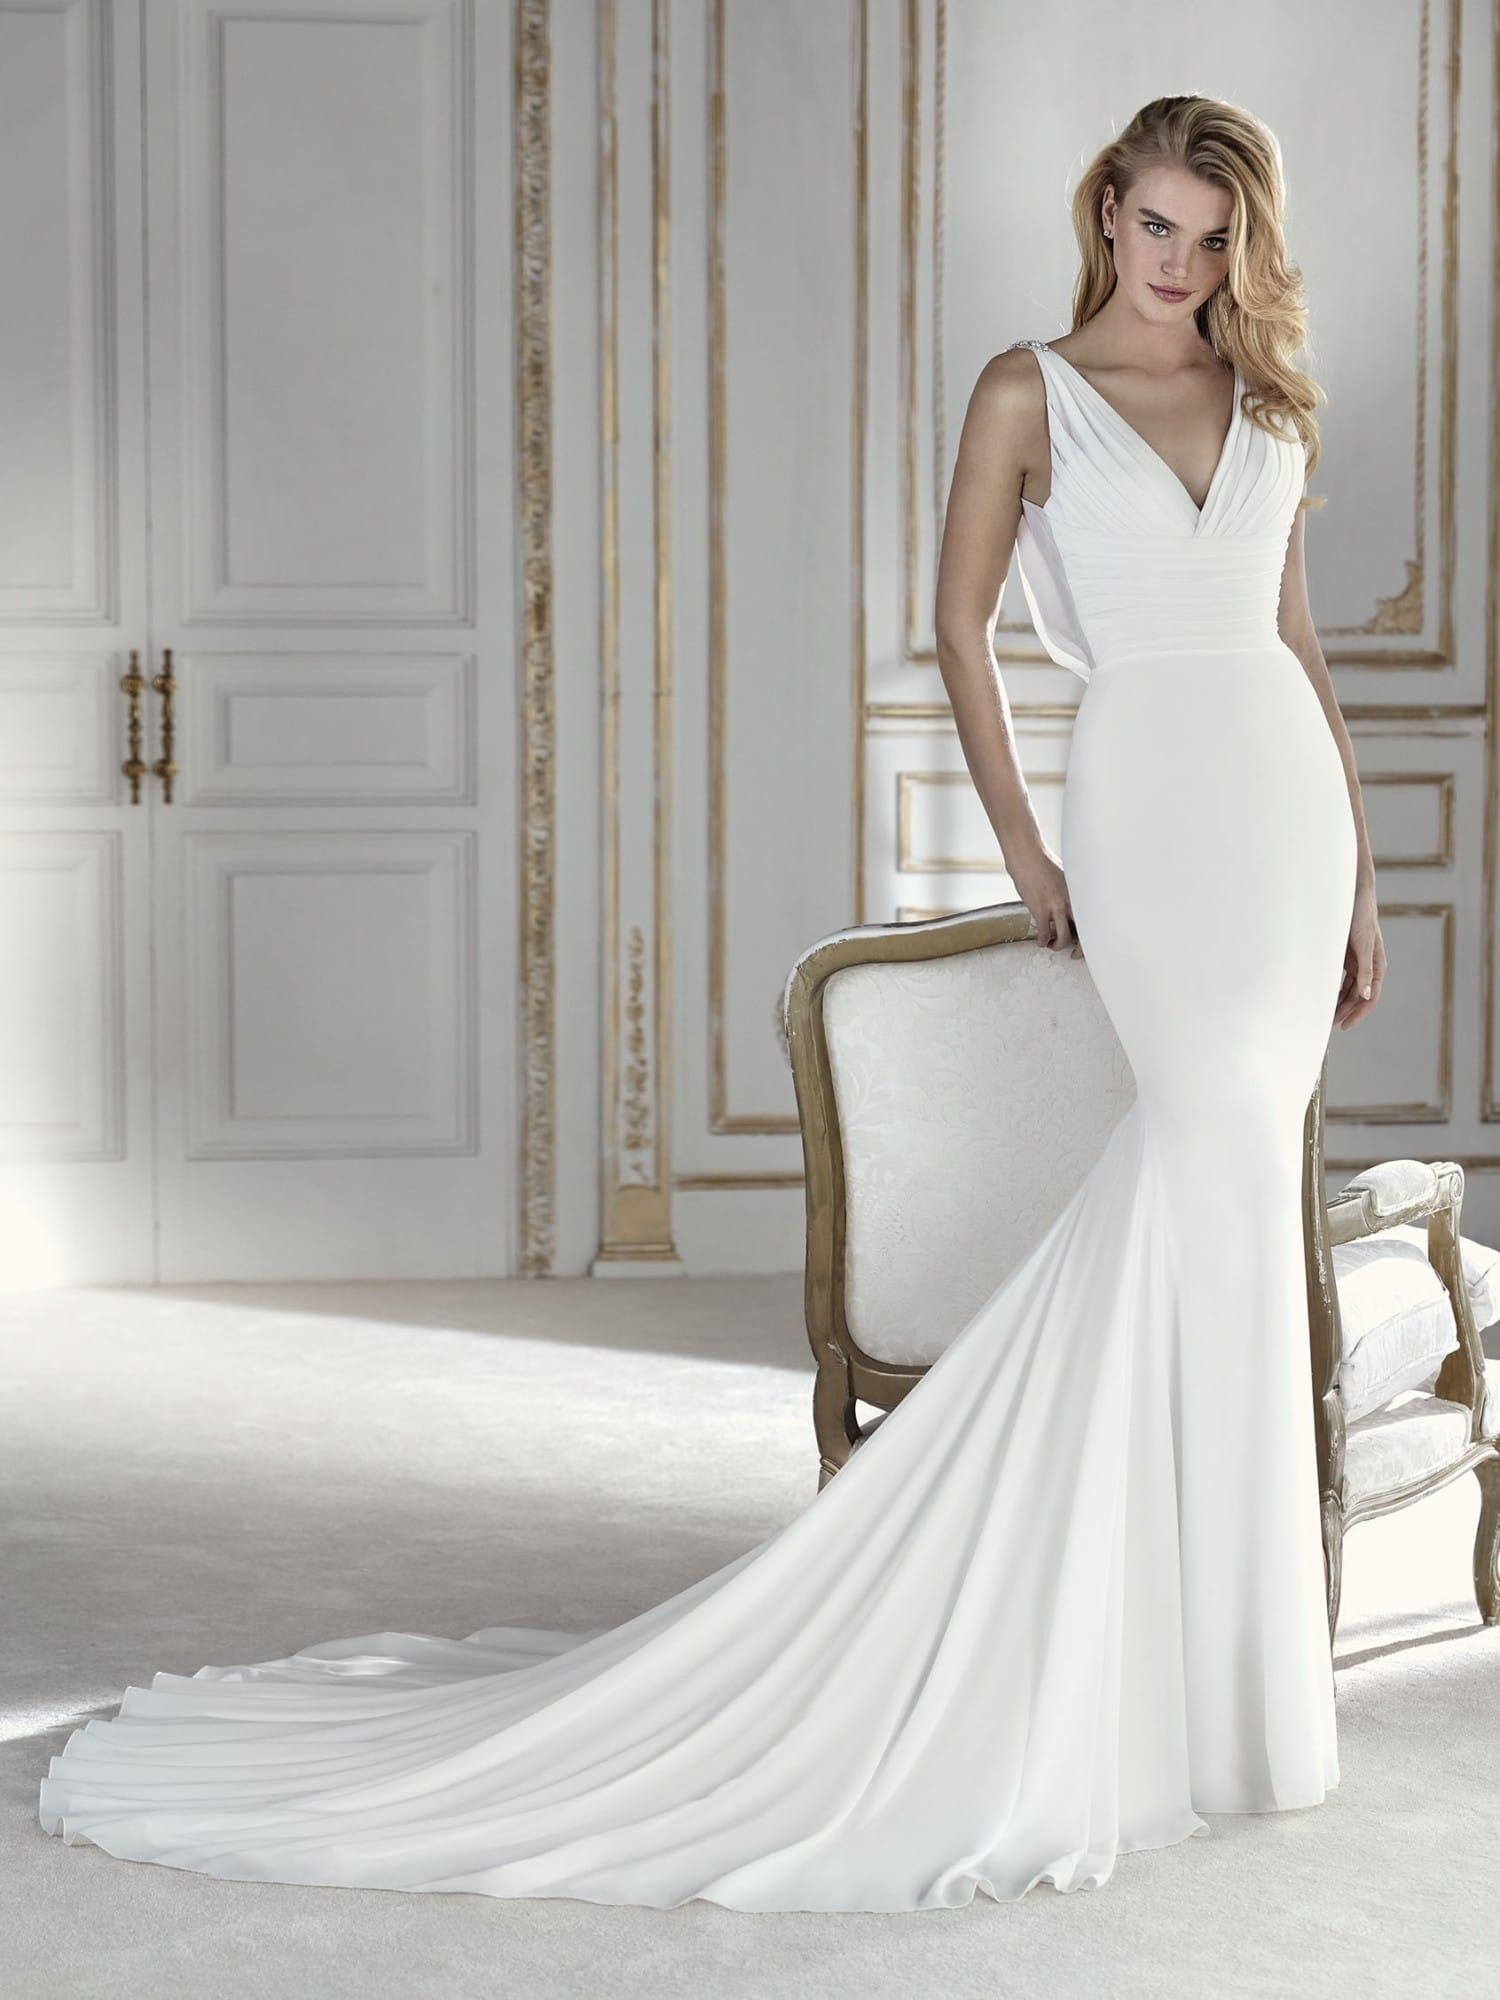 La Sposa Palpito – light and elegant dress